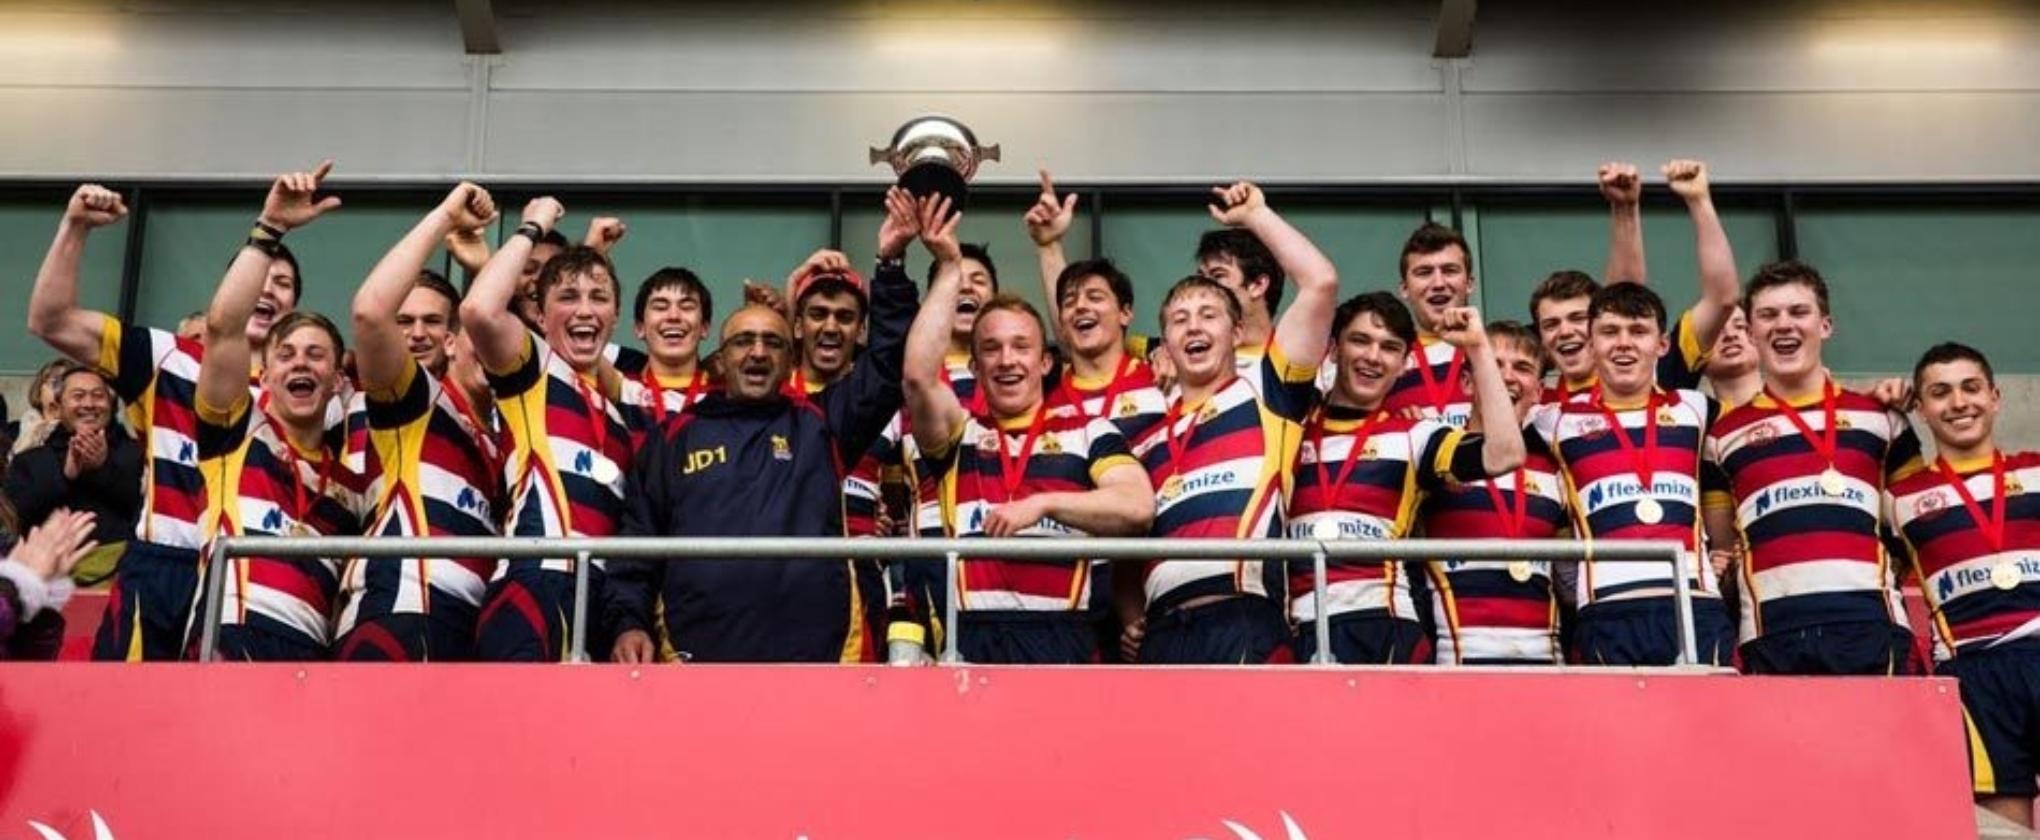 Fleximize-Sponsored Rugby Team Wins Big